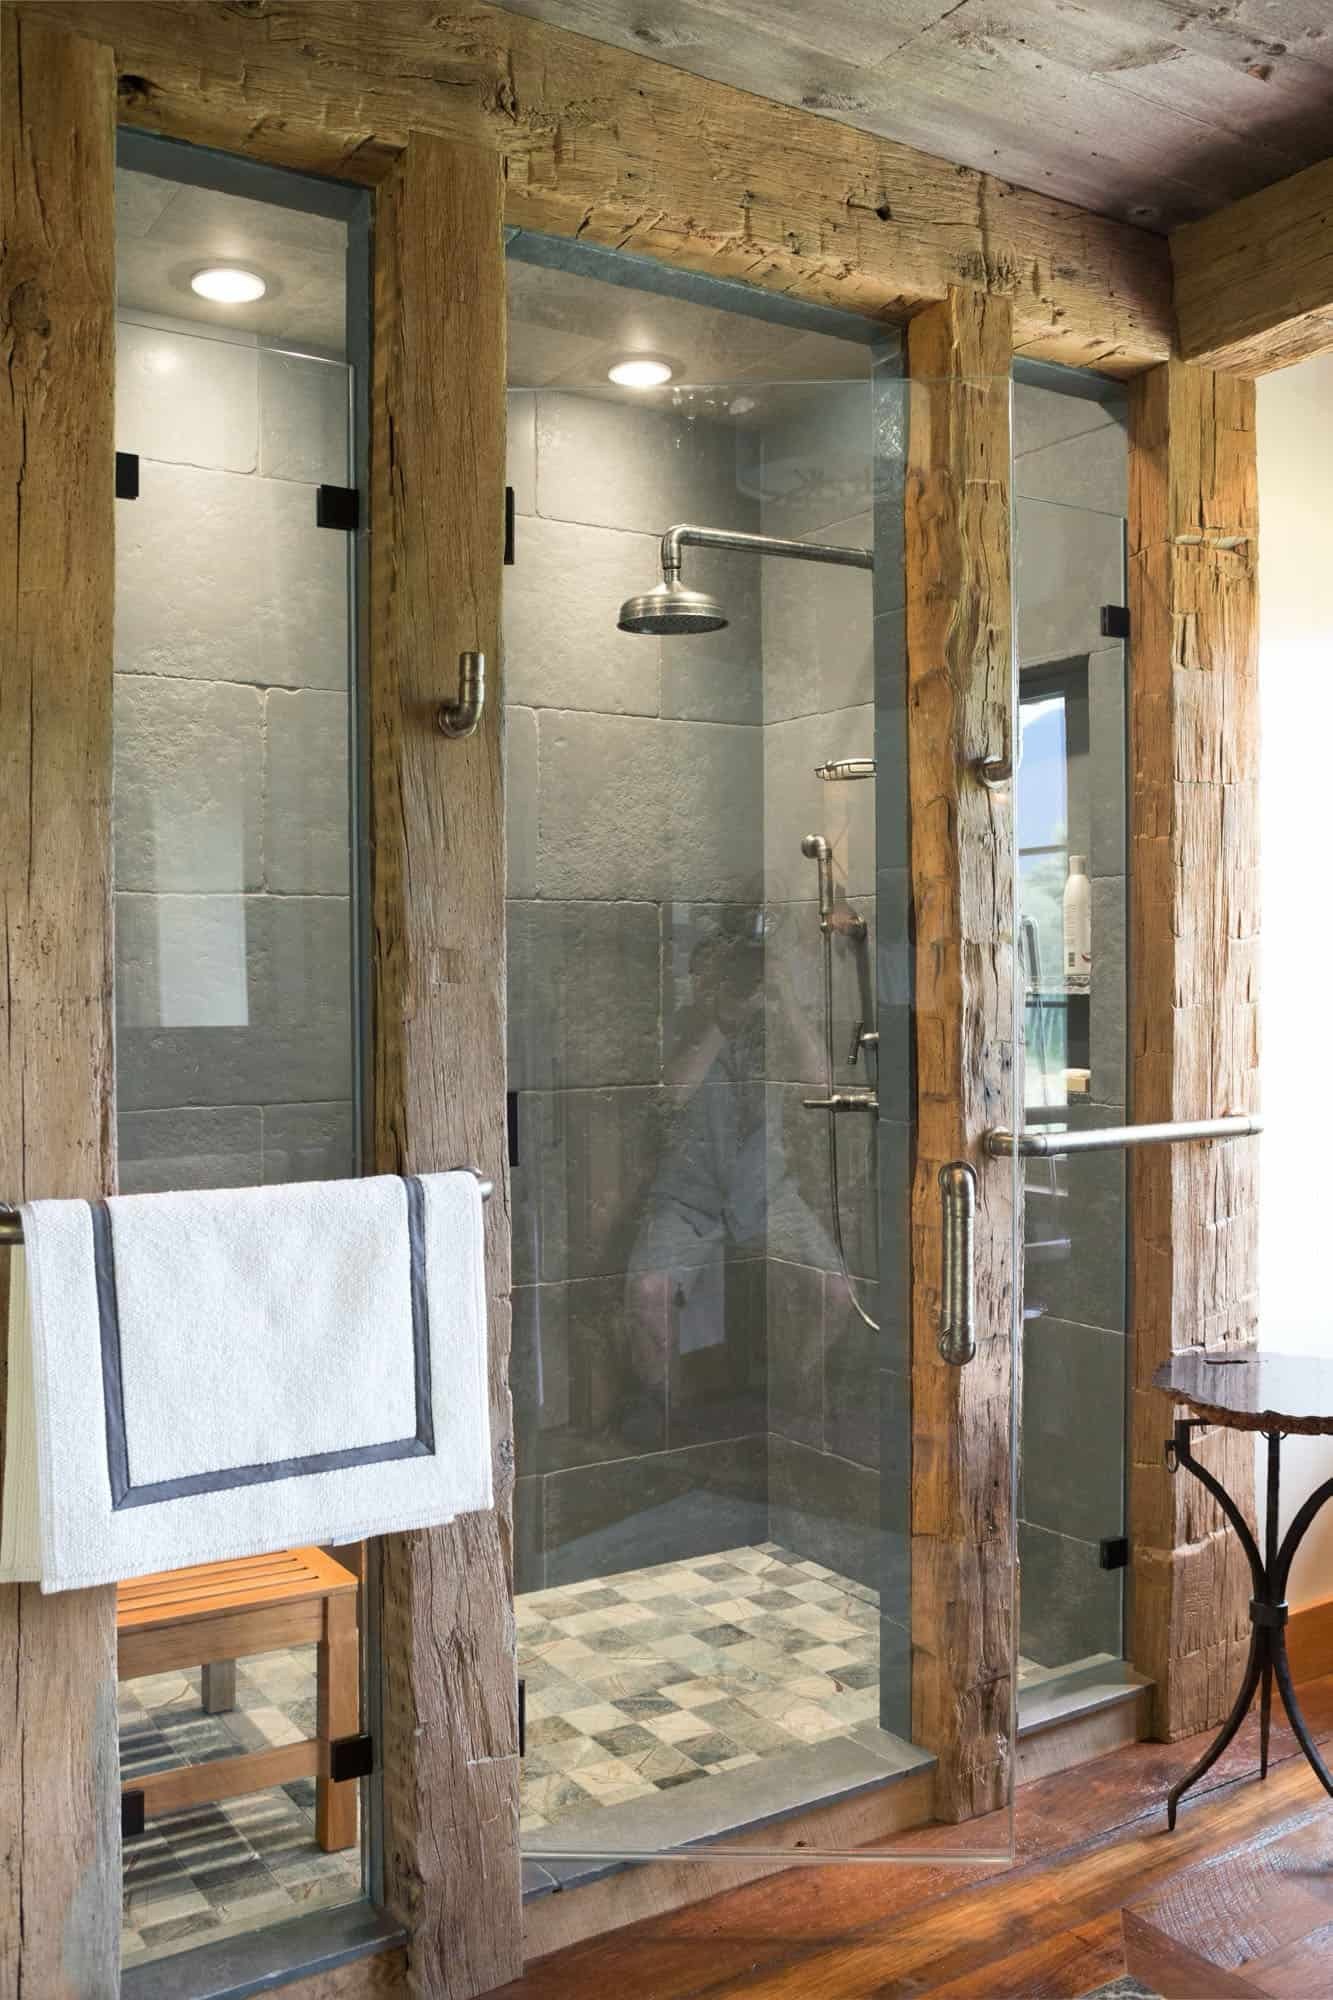 salle-de-bain-rustique-principale-douche